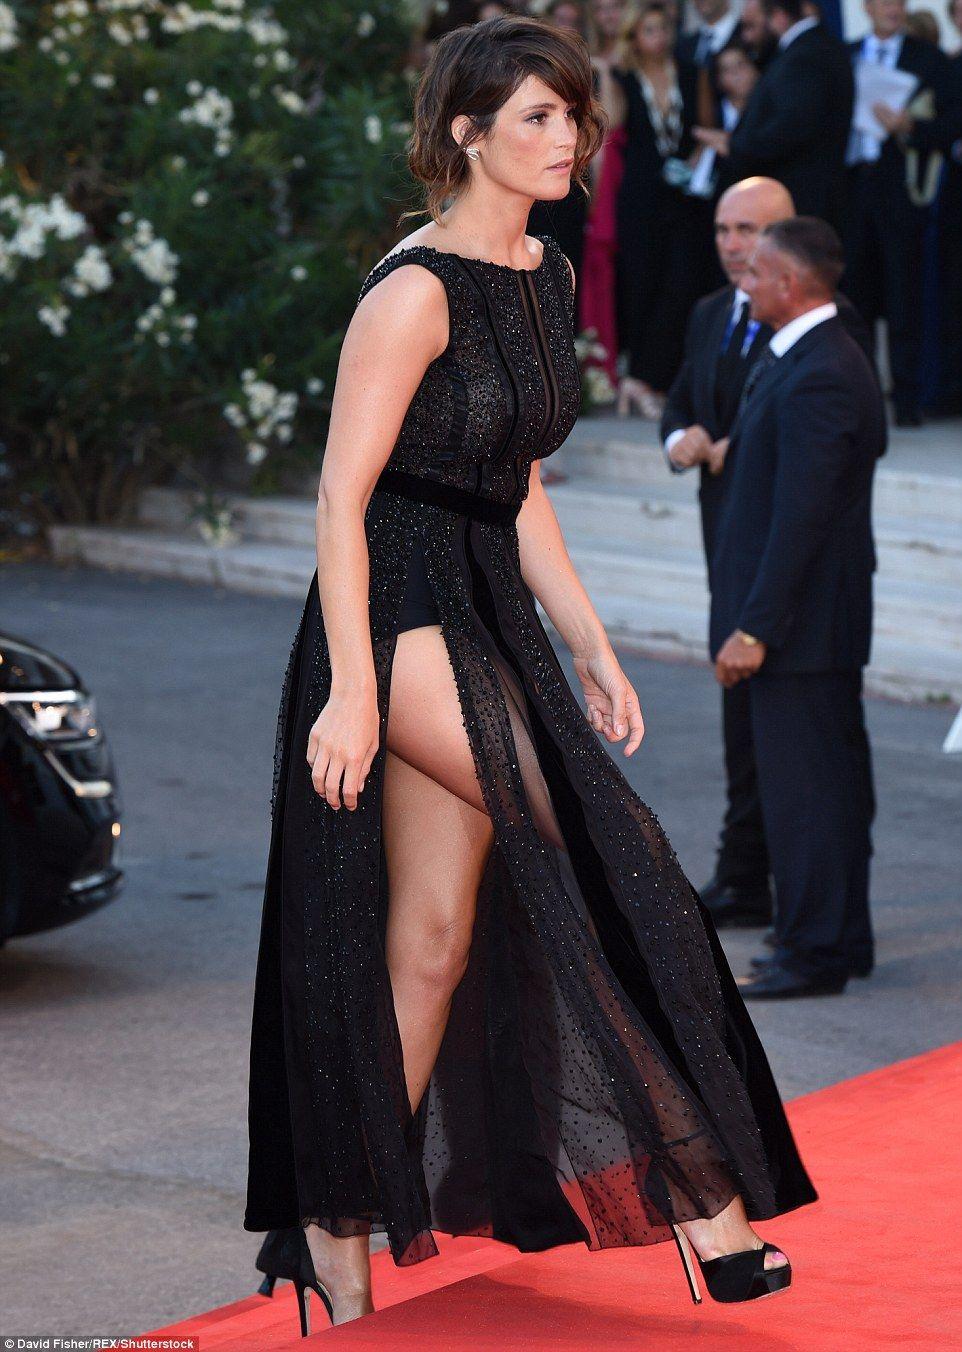 Gemma Arterton steals the Venice Film Festival red carpet